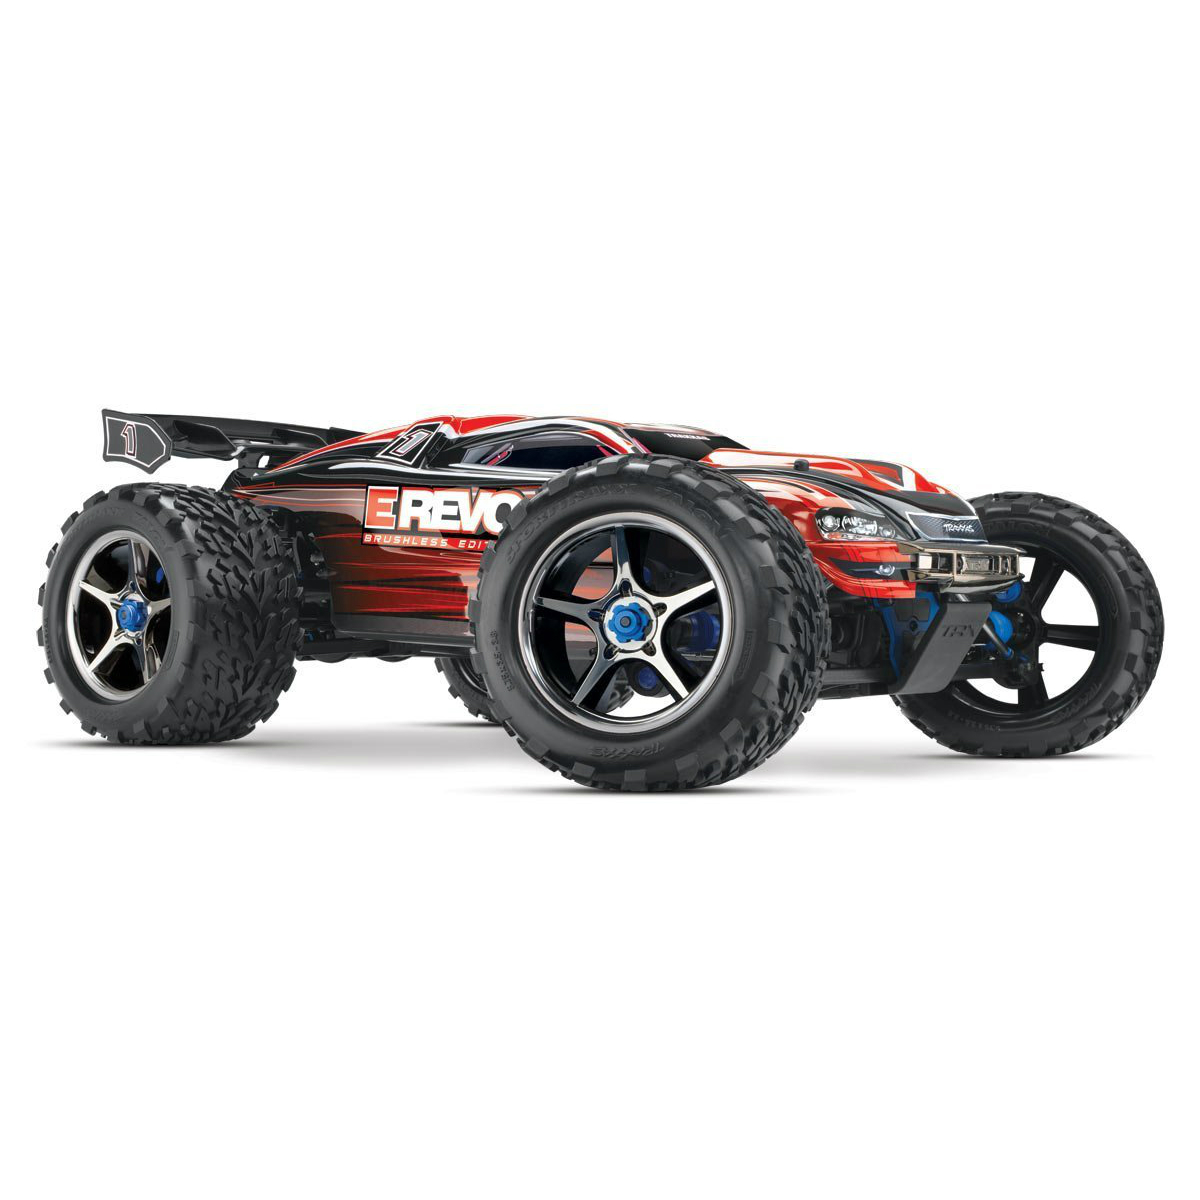 Traxxas 56086 4 E Revo Racing Monster Truck For Sale In